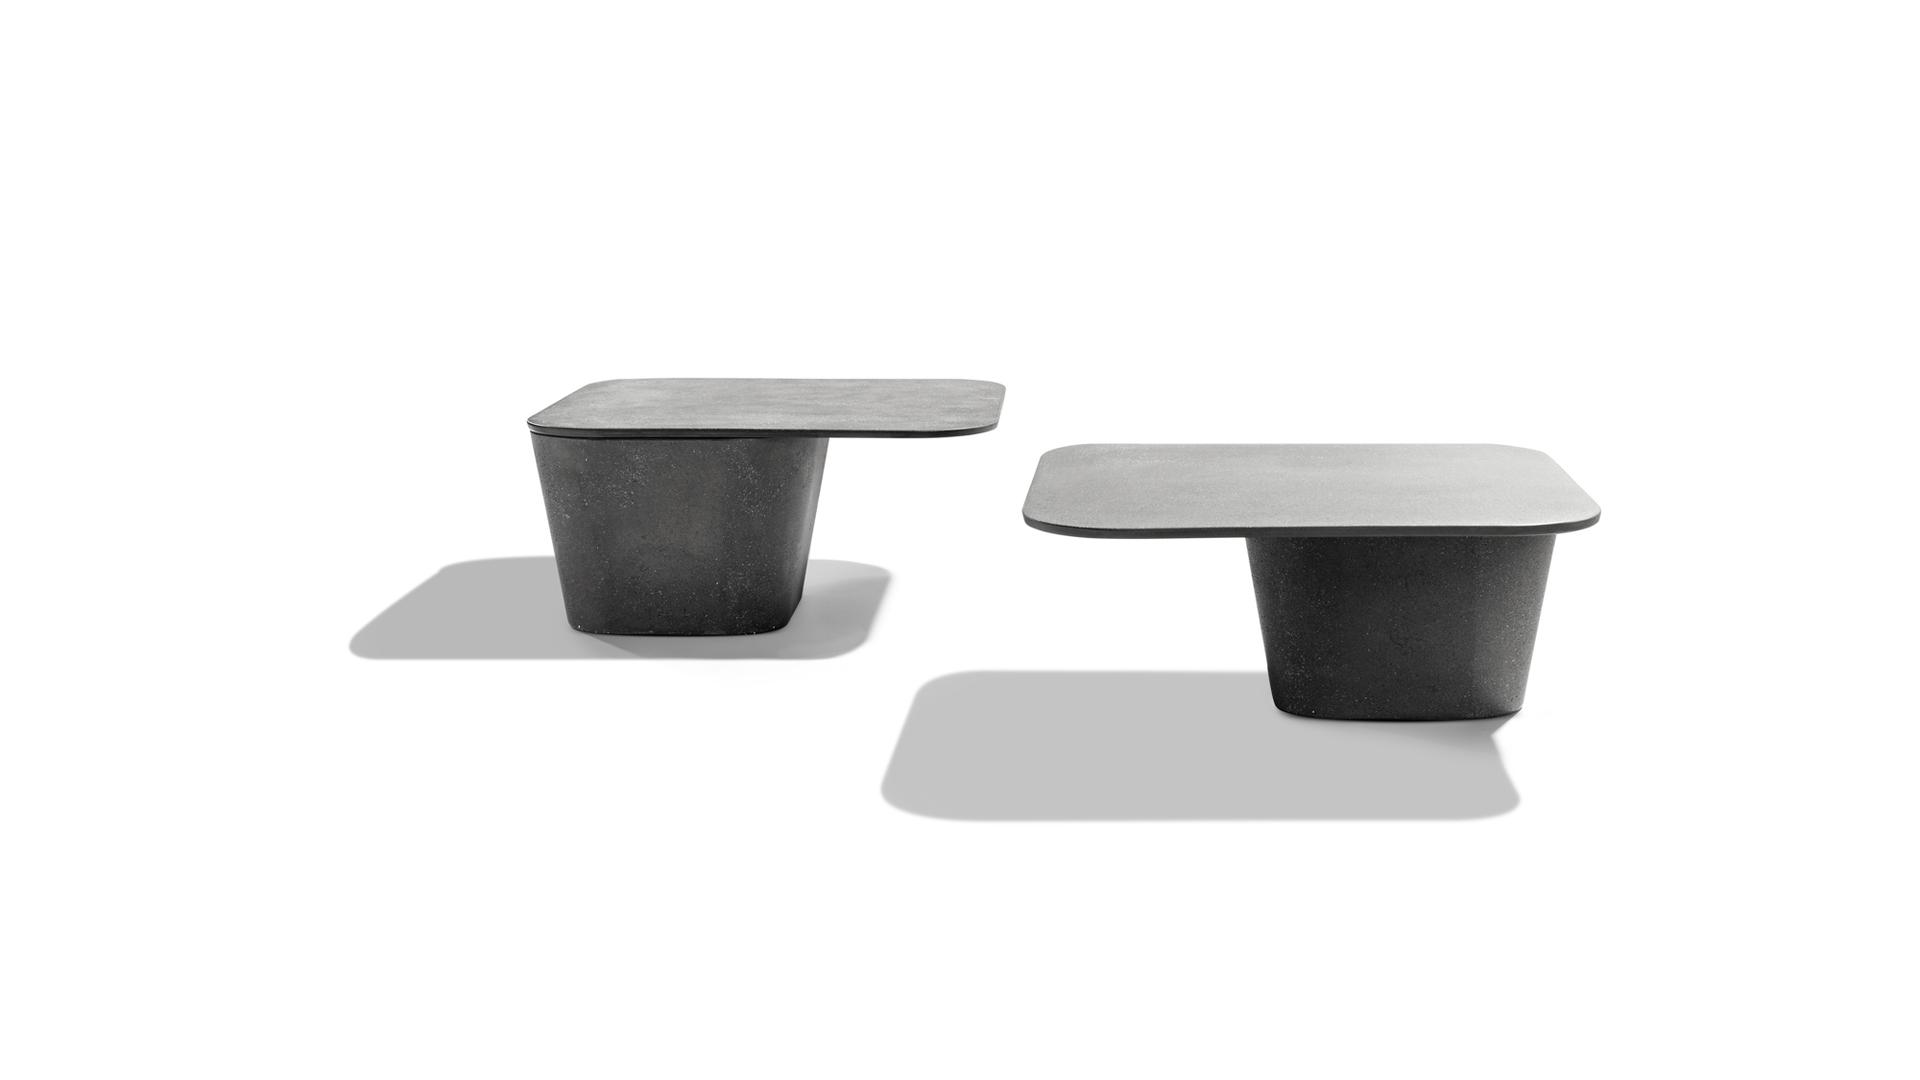 Tao-coffee-tables-with-shadow.jpg